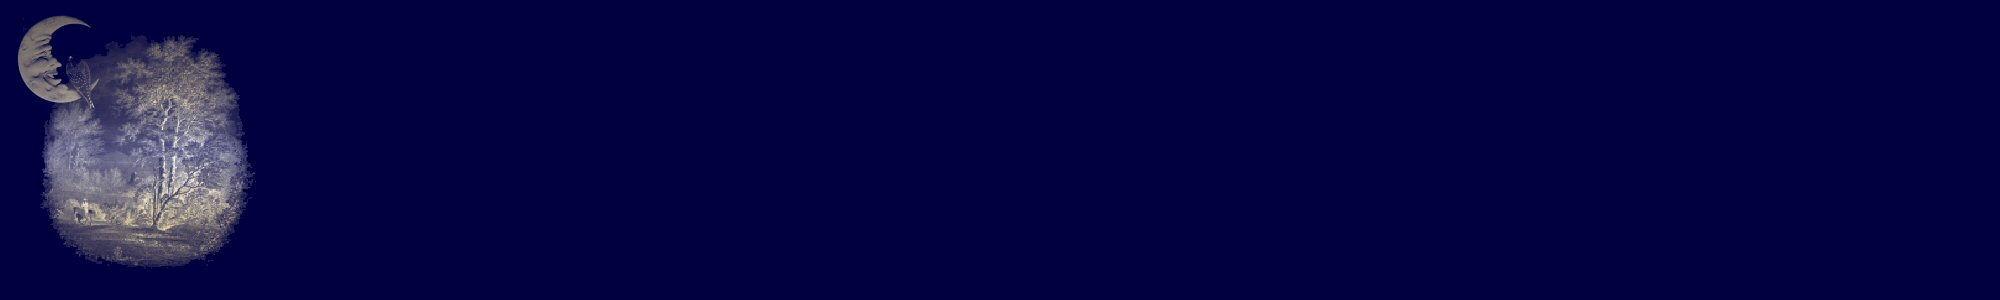 Fondo IM campos_nieve_noche_001.imf